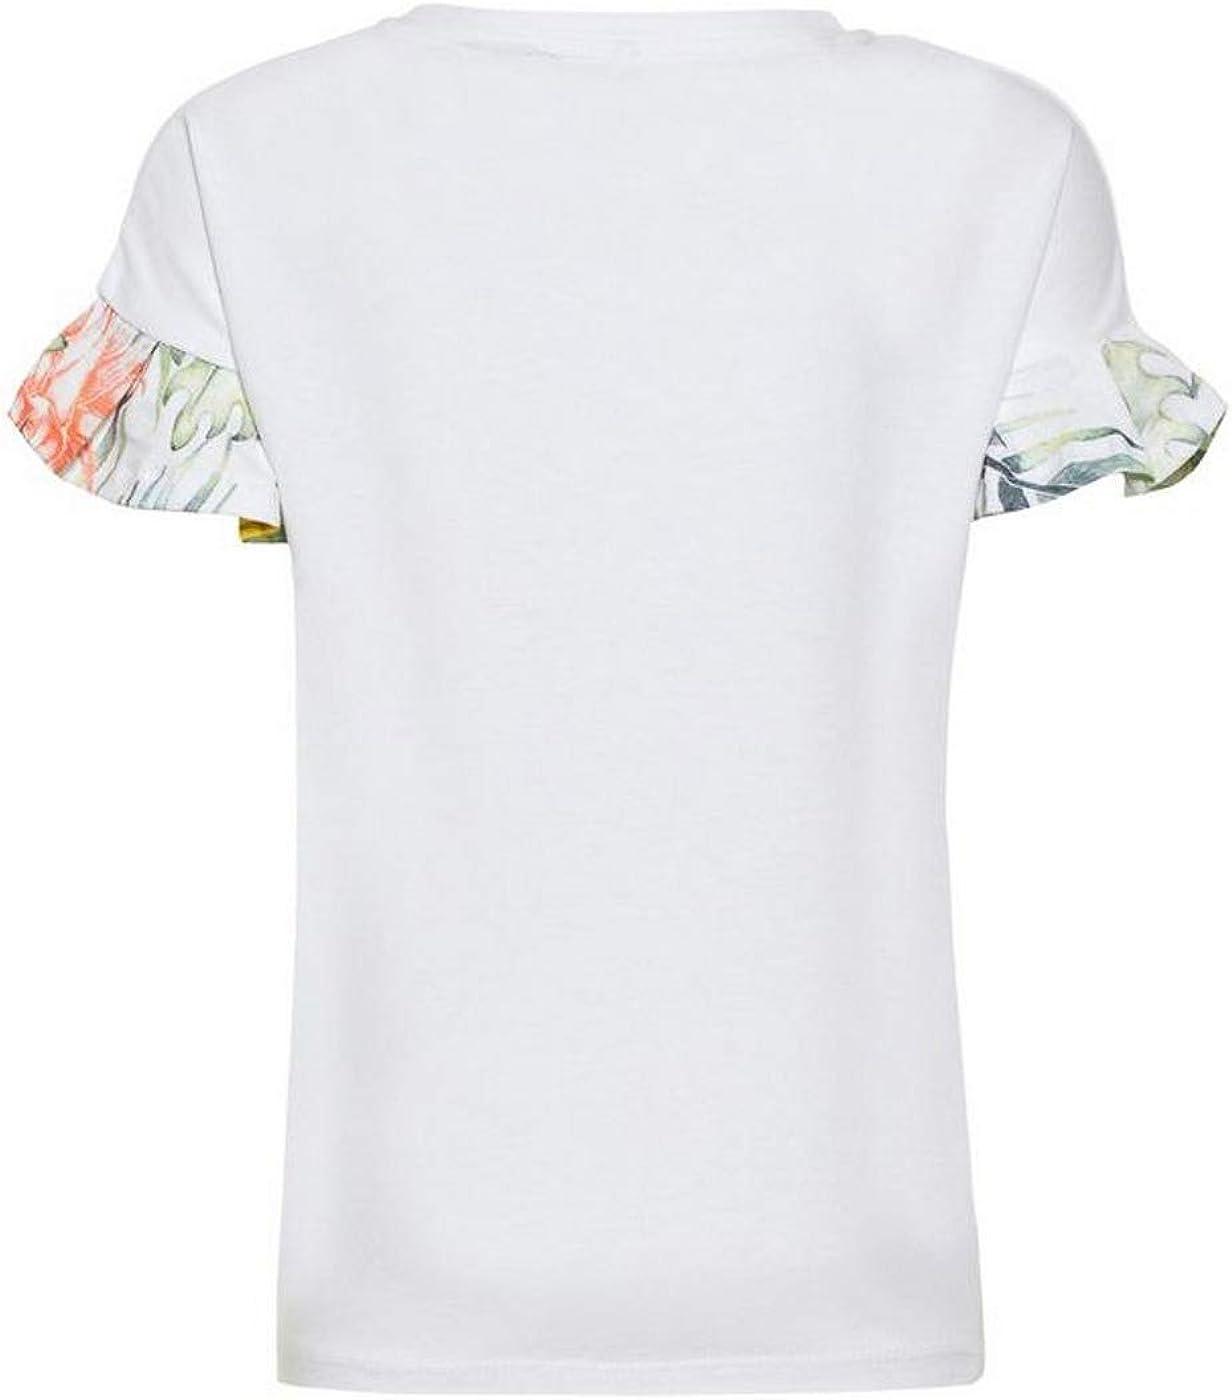 NAME IT Camiseta Niña Blanca Shine 13165554: Amazon.es: Ropa y accesorios